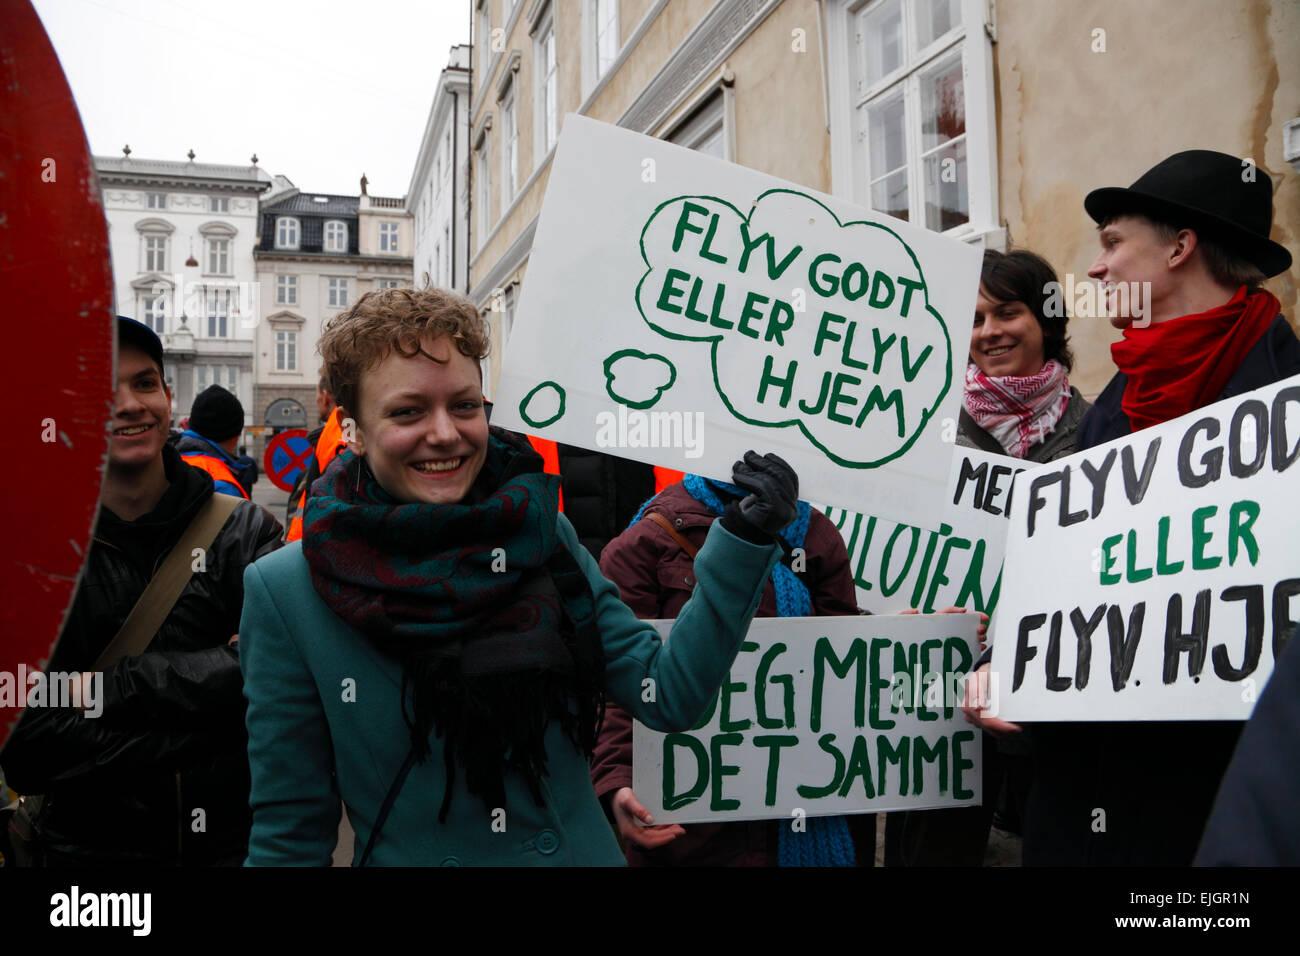 Copenhagen, Denmark. 26th March, 2015. Ryanair's representatives were met by several hundreds demonstrating trade - Stock Image